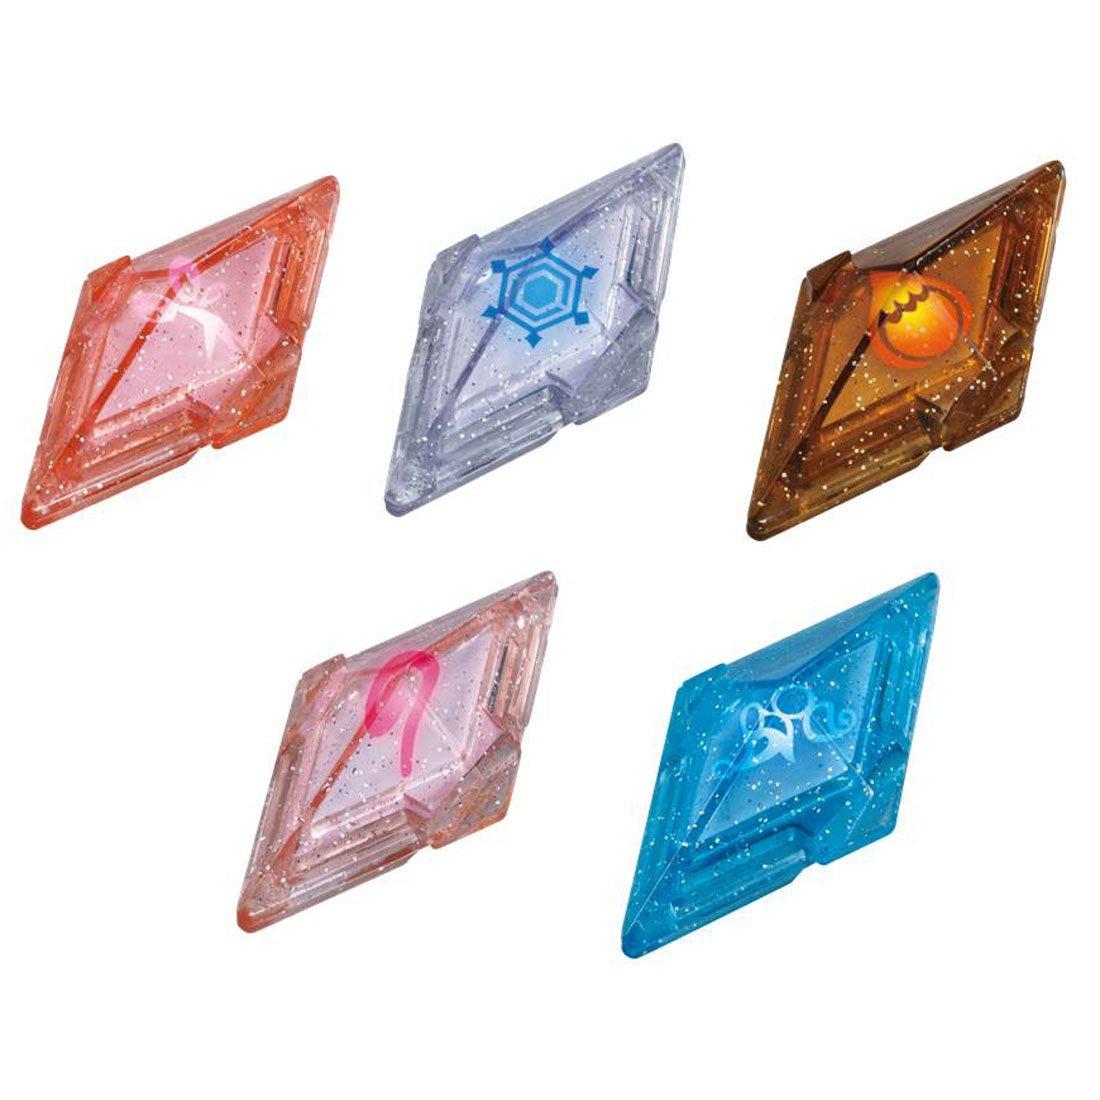 Pokemon Z Crystal Vol.03 water lily & Ririe set: Buy Online at Best Price  in UAE - Amazon.ae